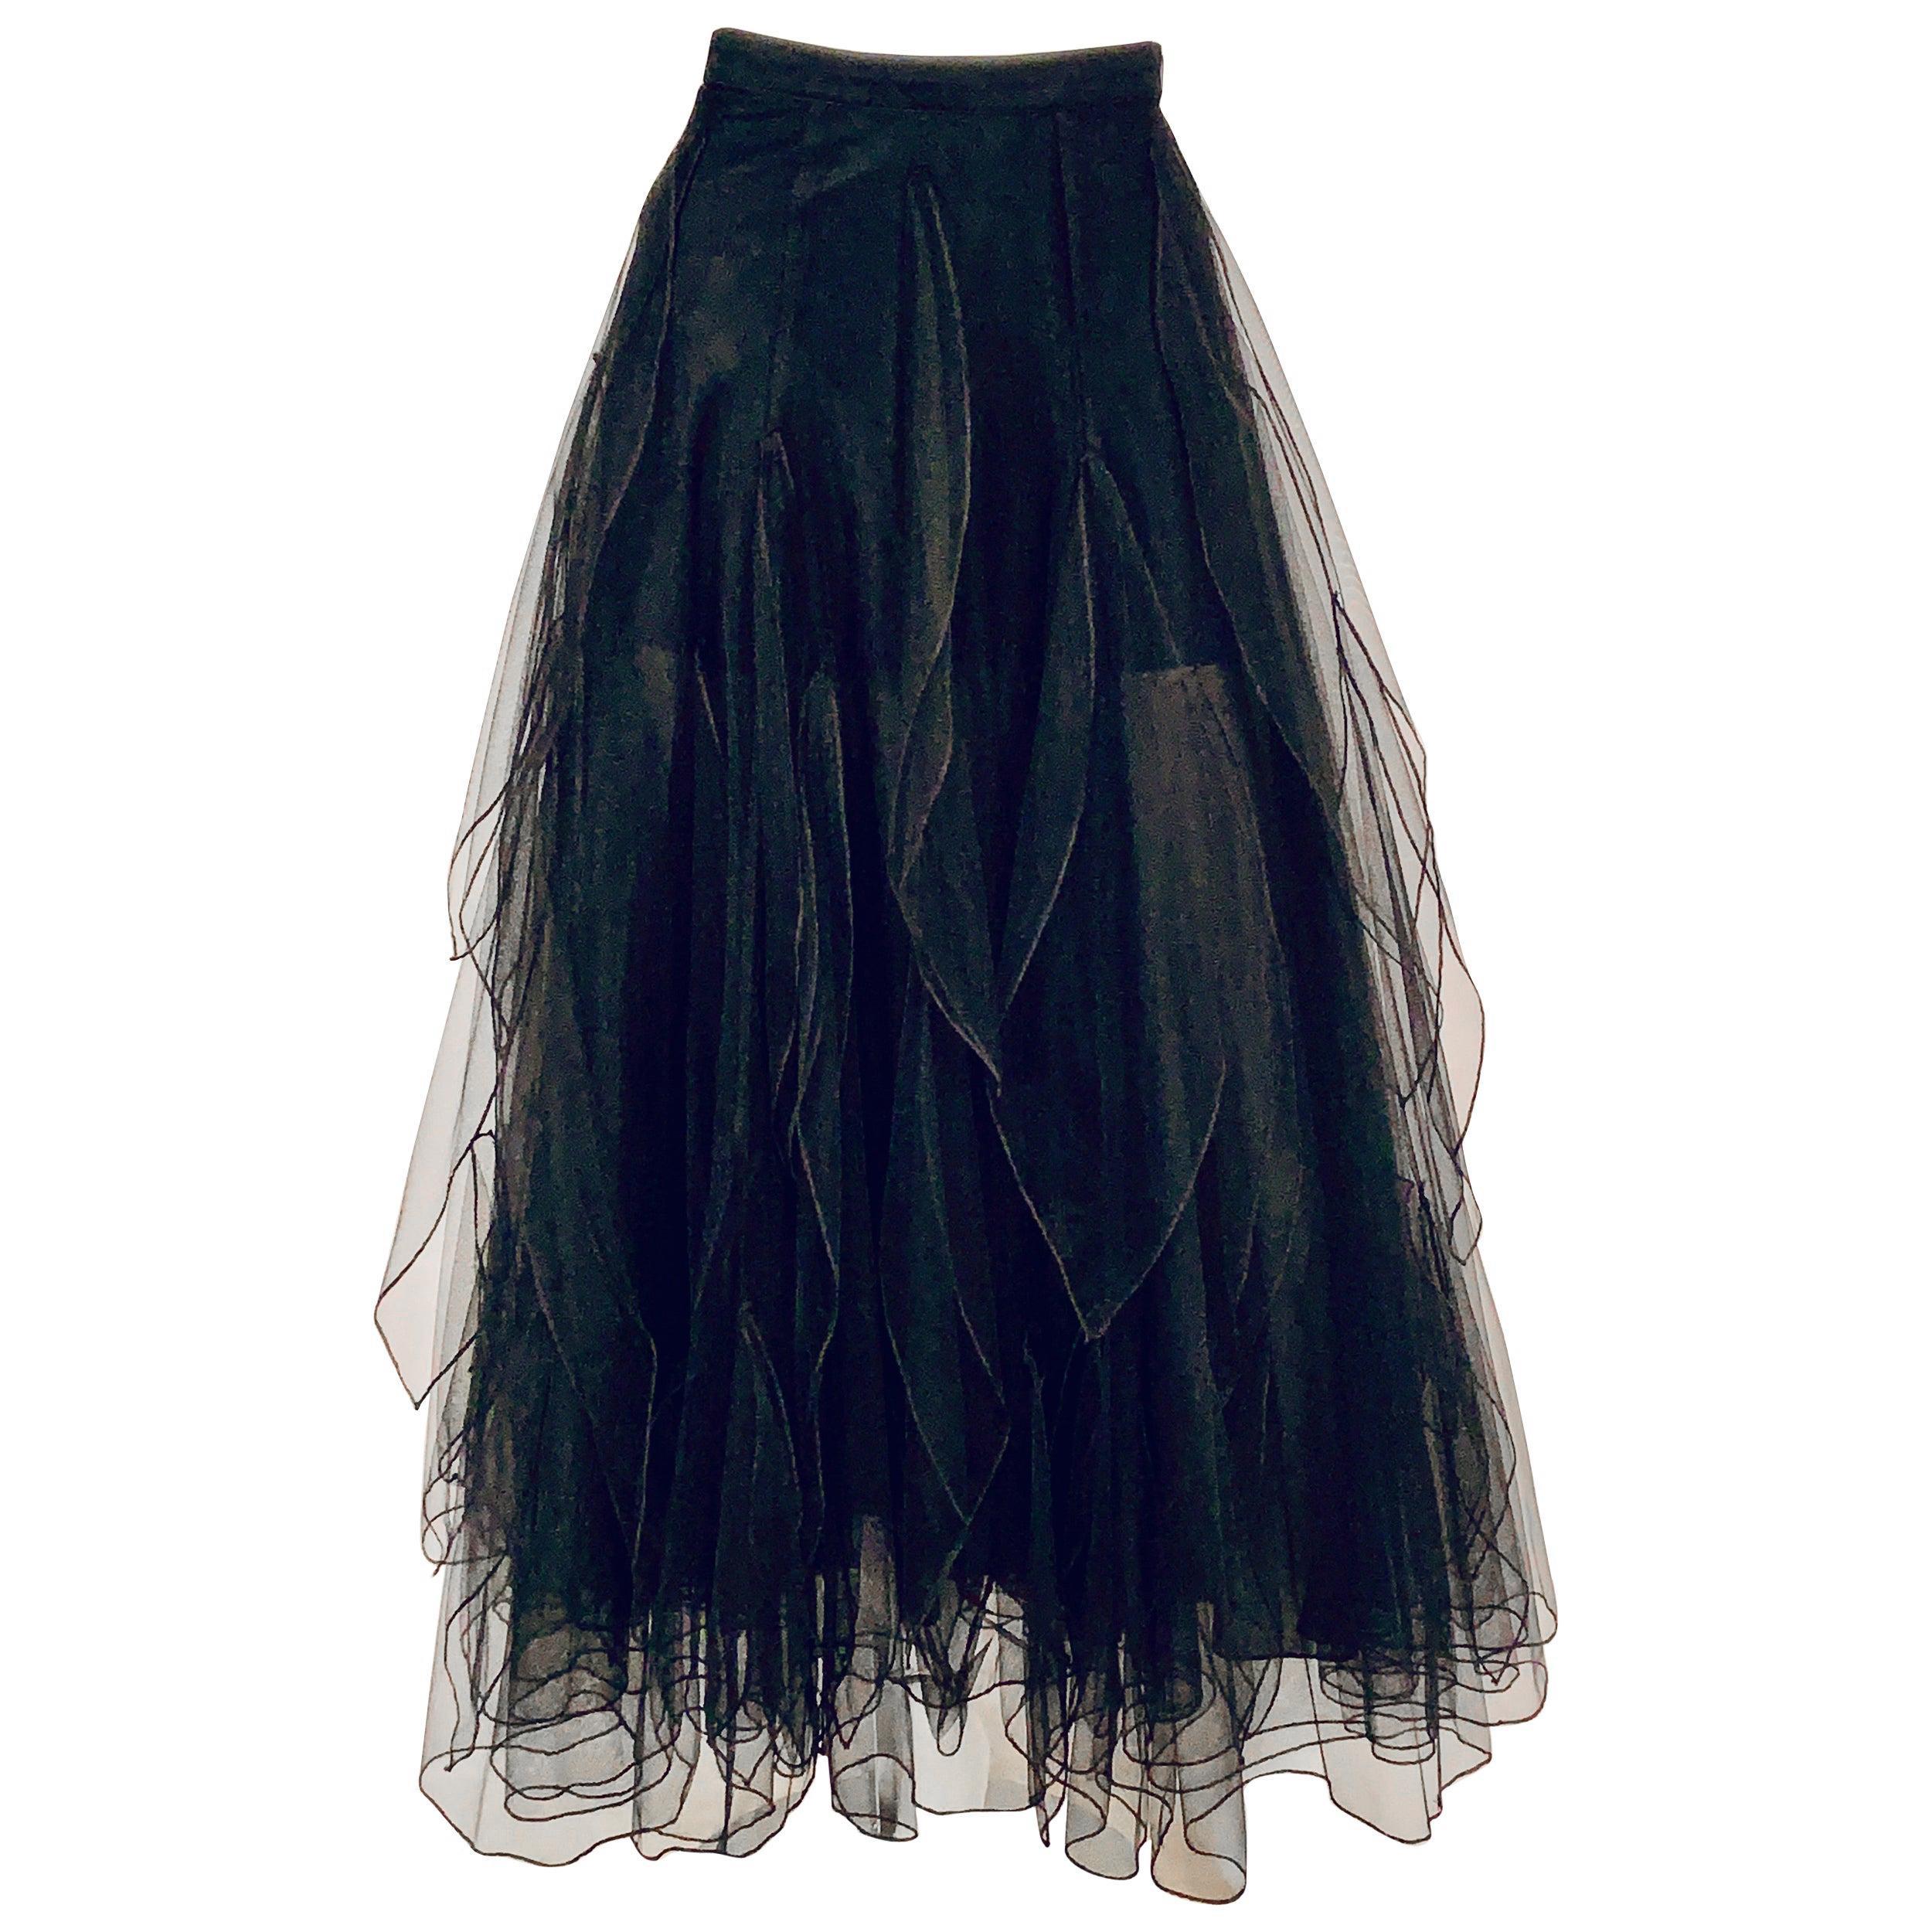 Rena Lange Appliqued Black Tulle Ballerina Skirt Very Short Black Silk Lining